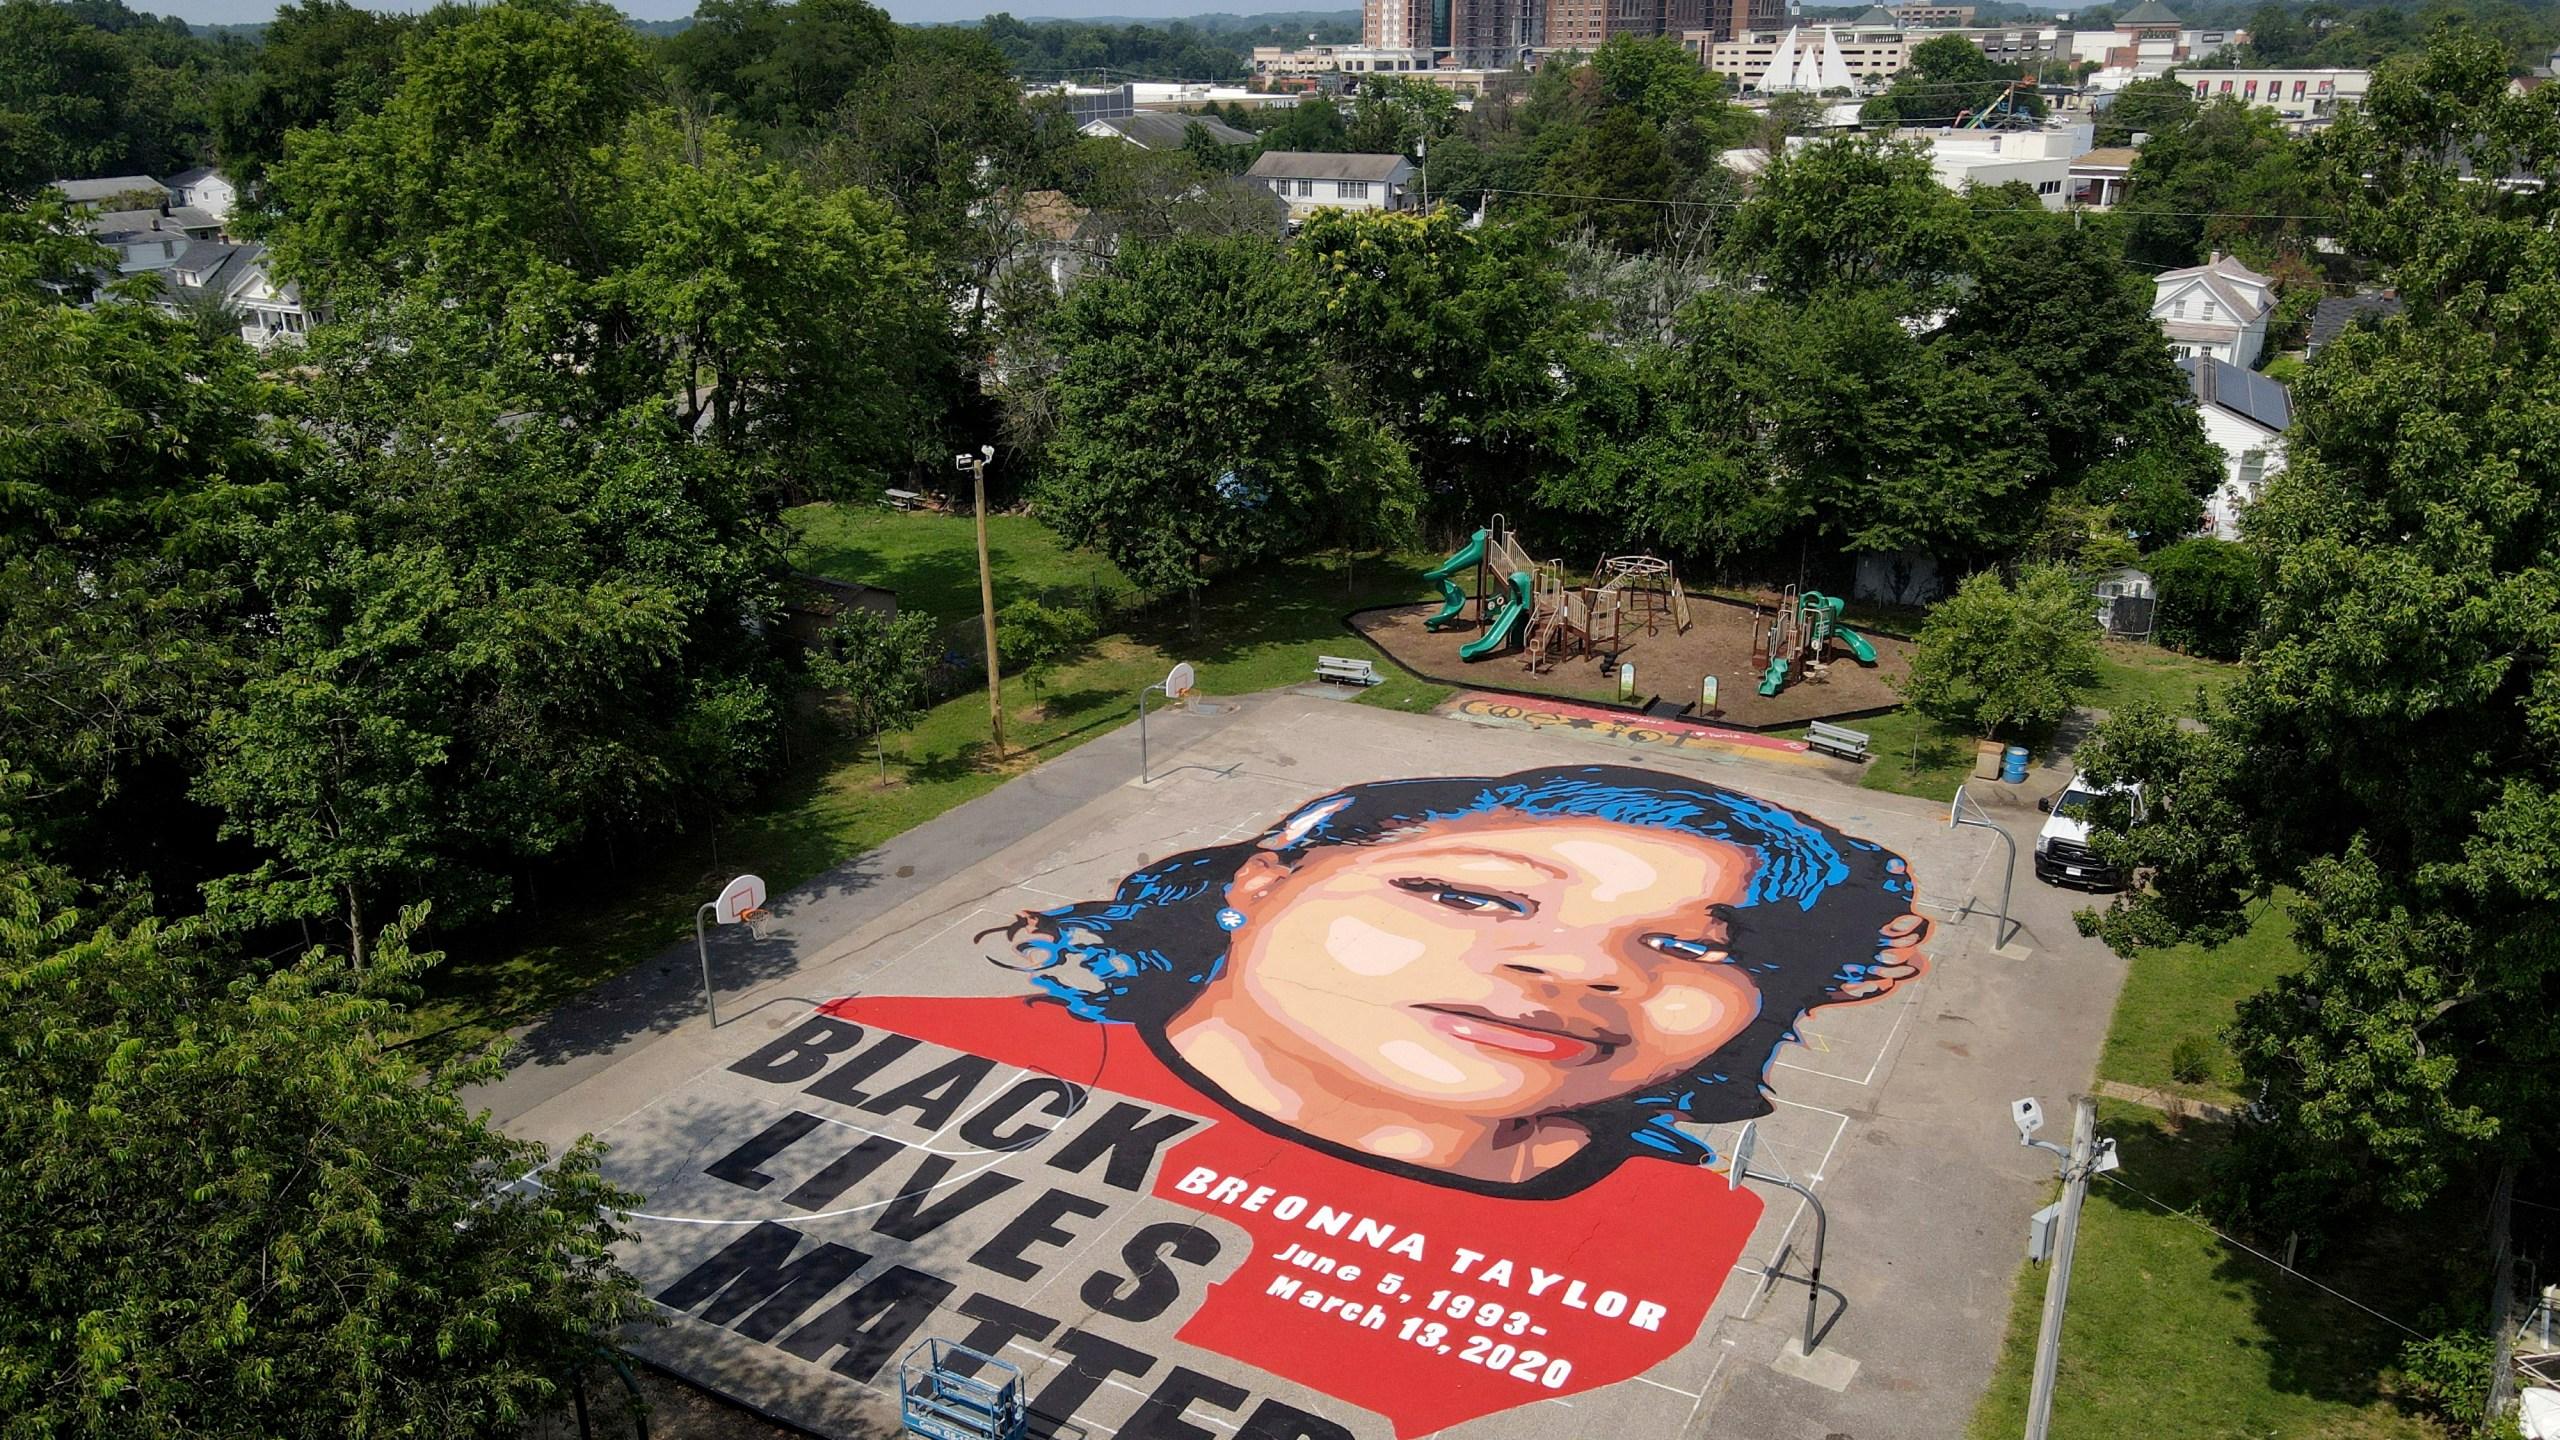 Breonna Taylor BLM mural